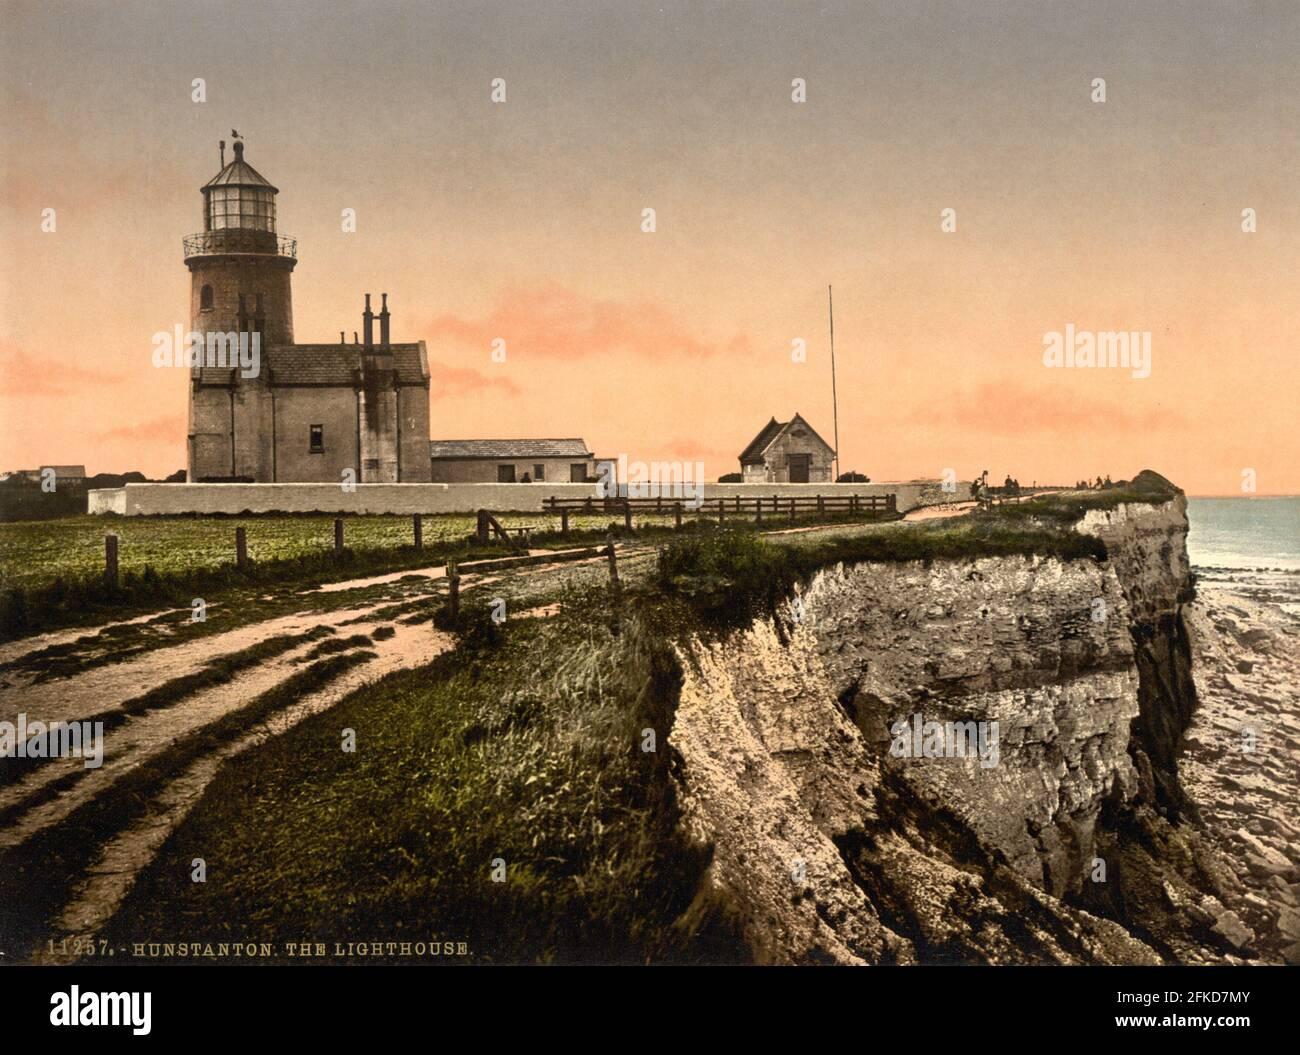 The Old Lighthouse, Hunstanton, Norfolk circa 1890-1900 Stock Photo